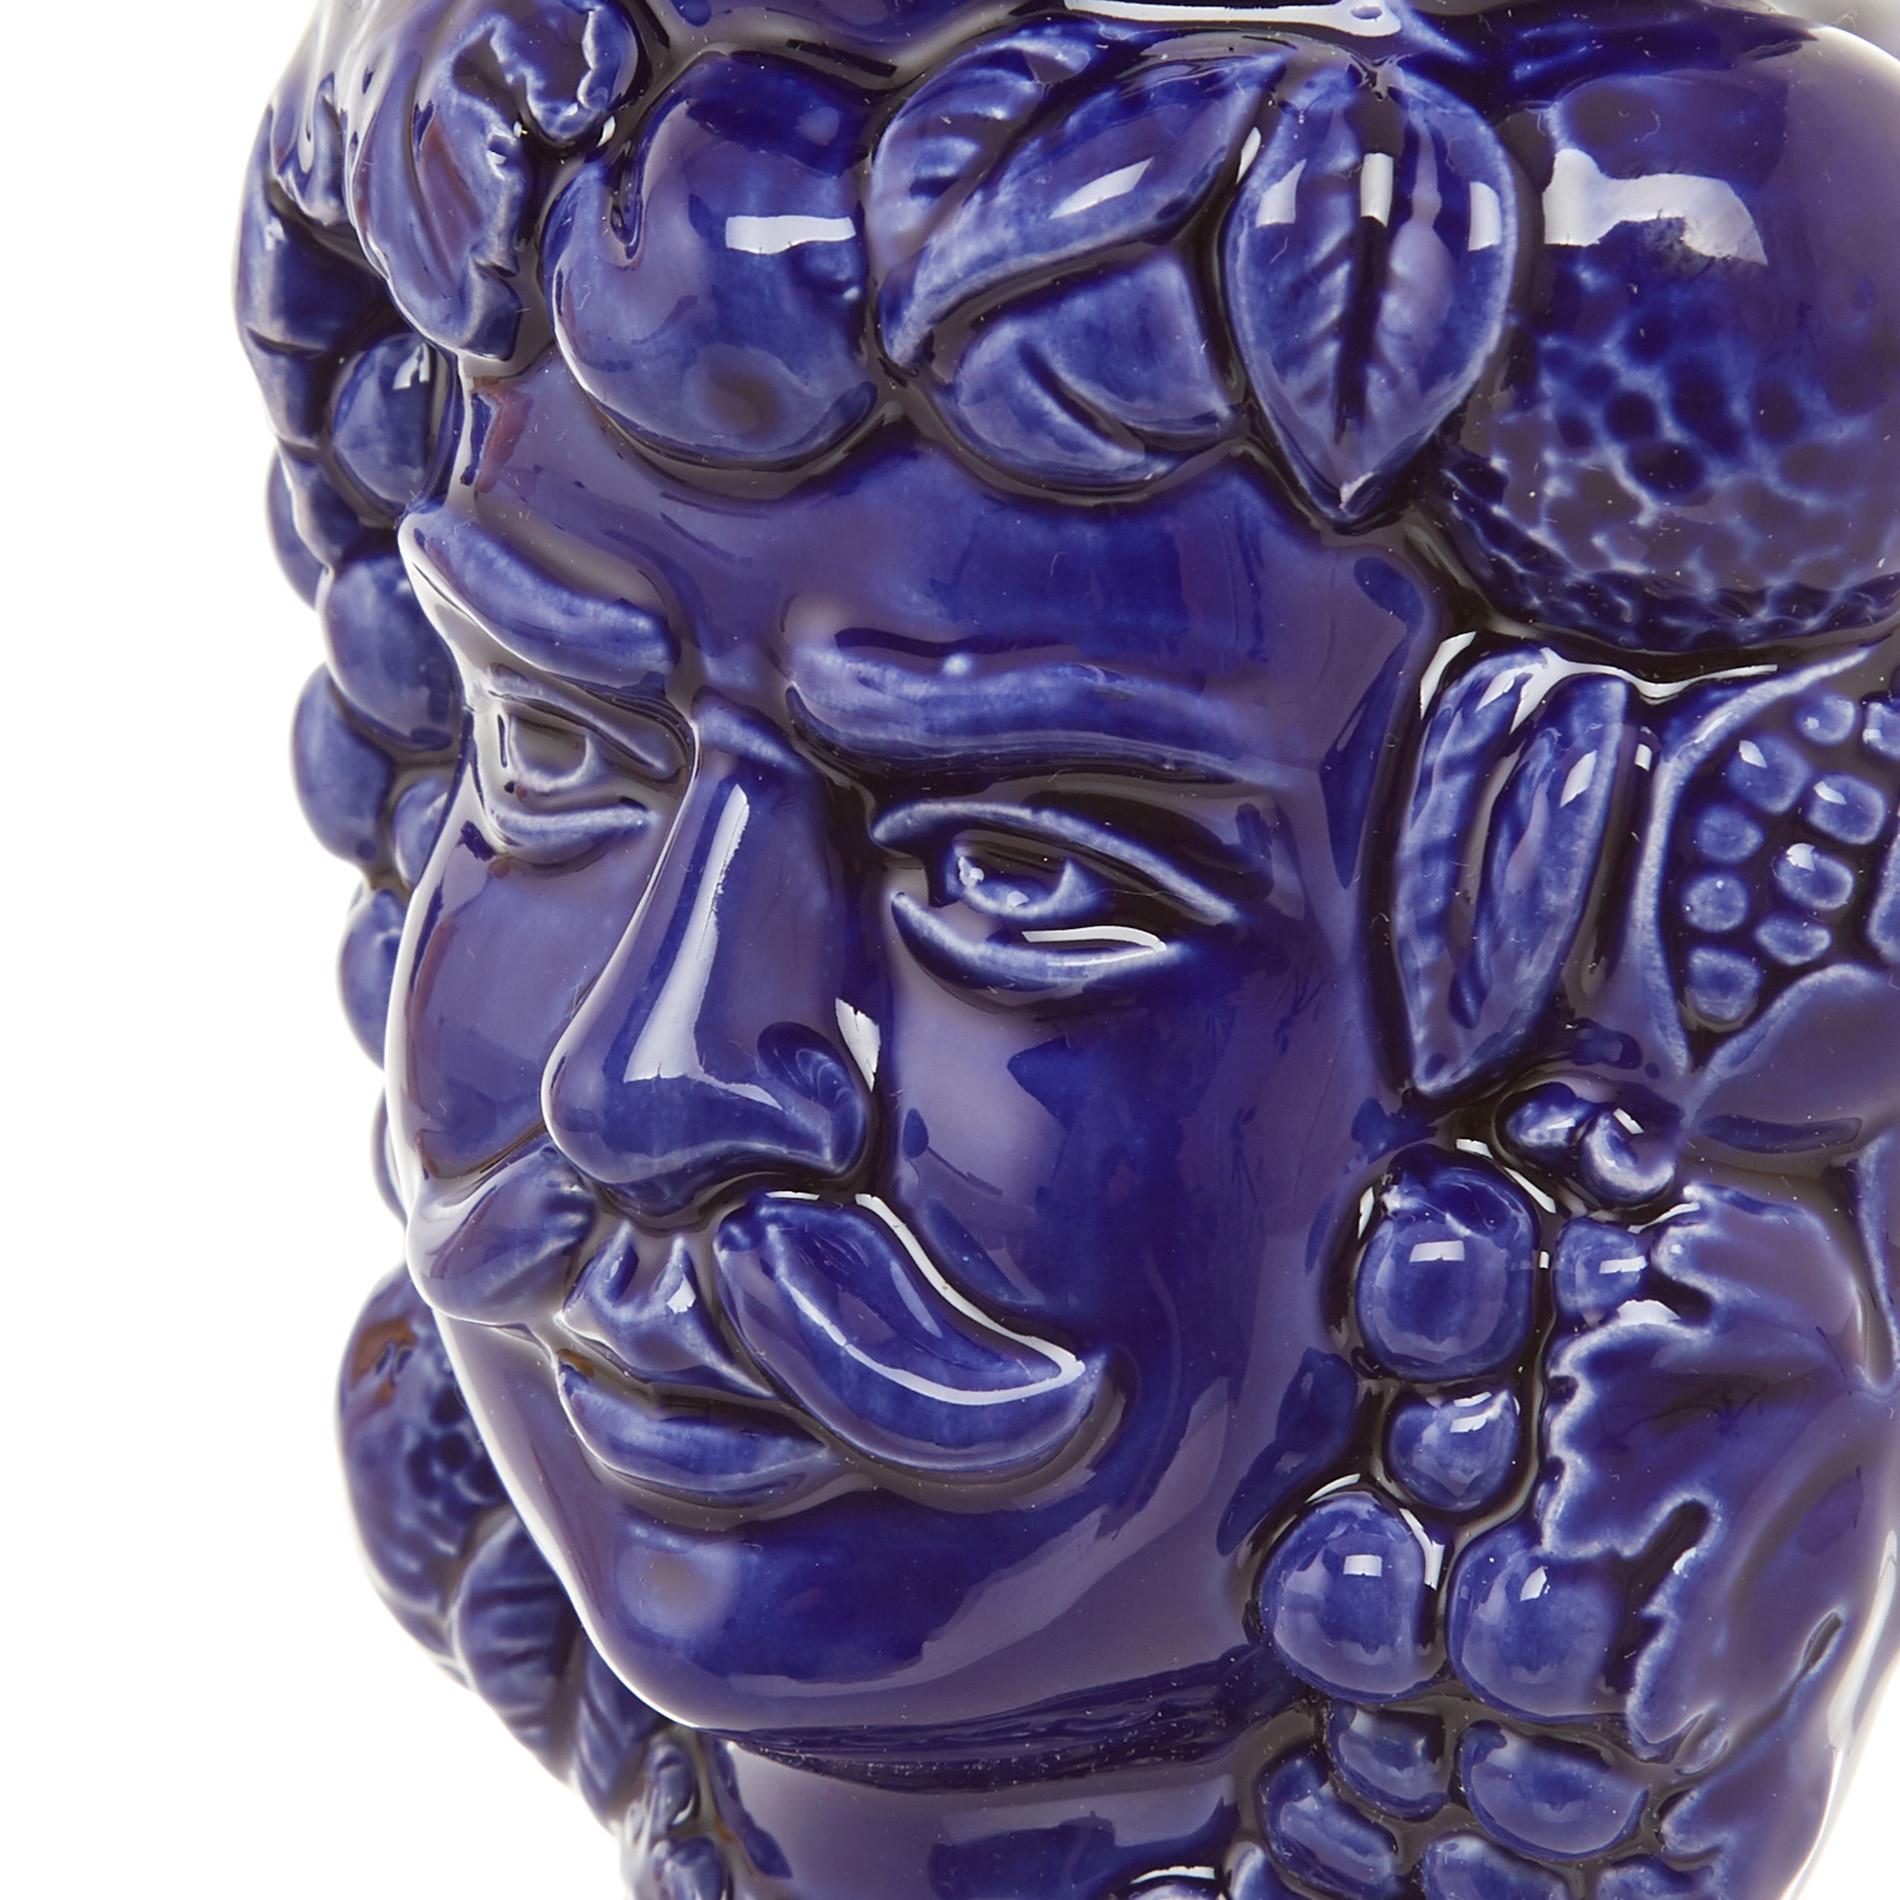 Testa di moro by Ceramiche Siciliane Ruggeri, Blu, large image number 3